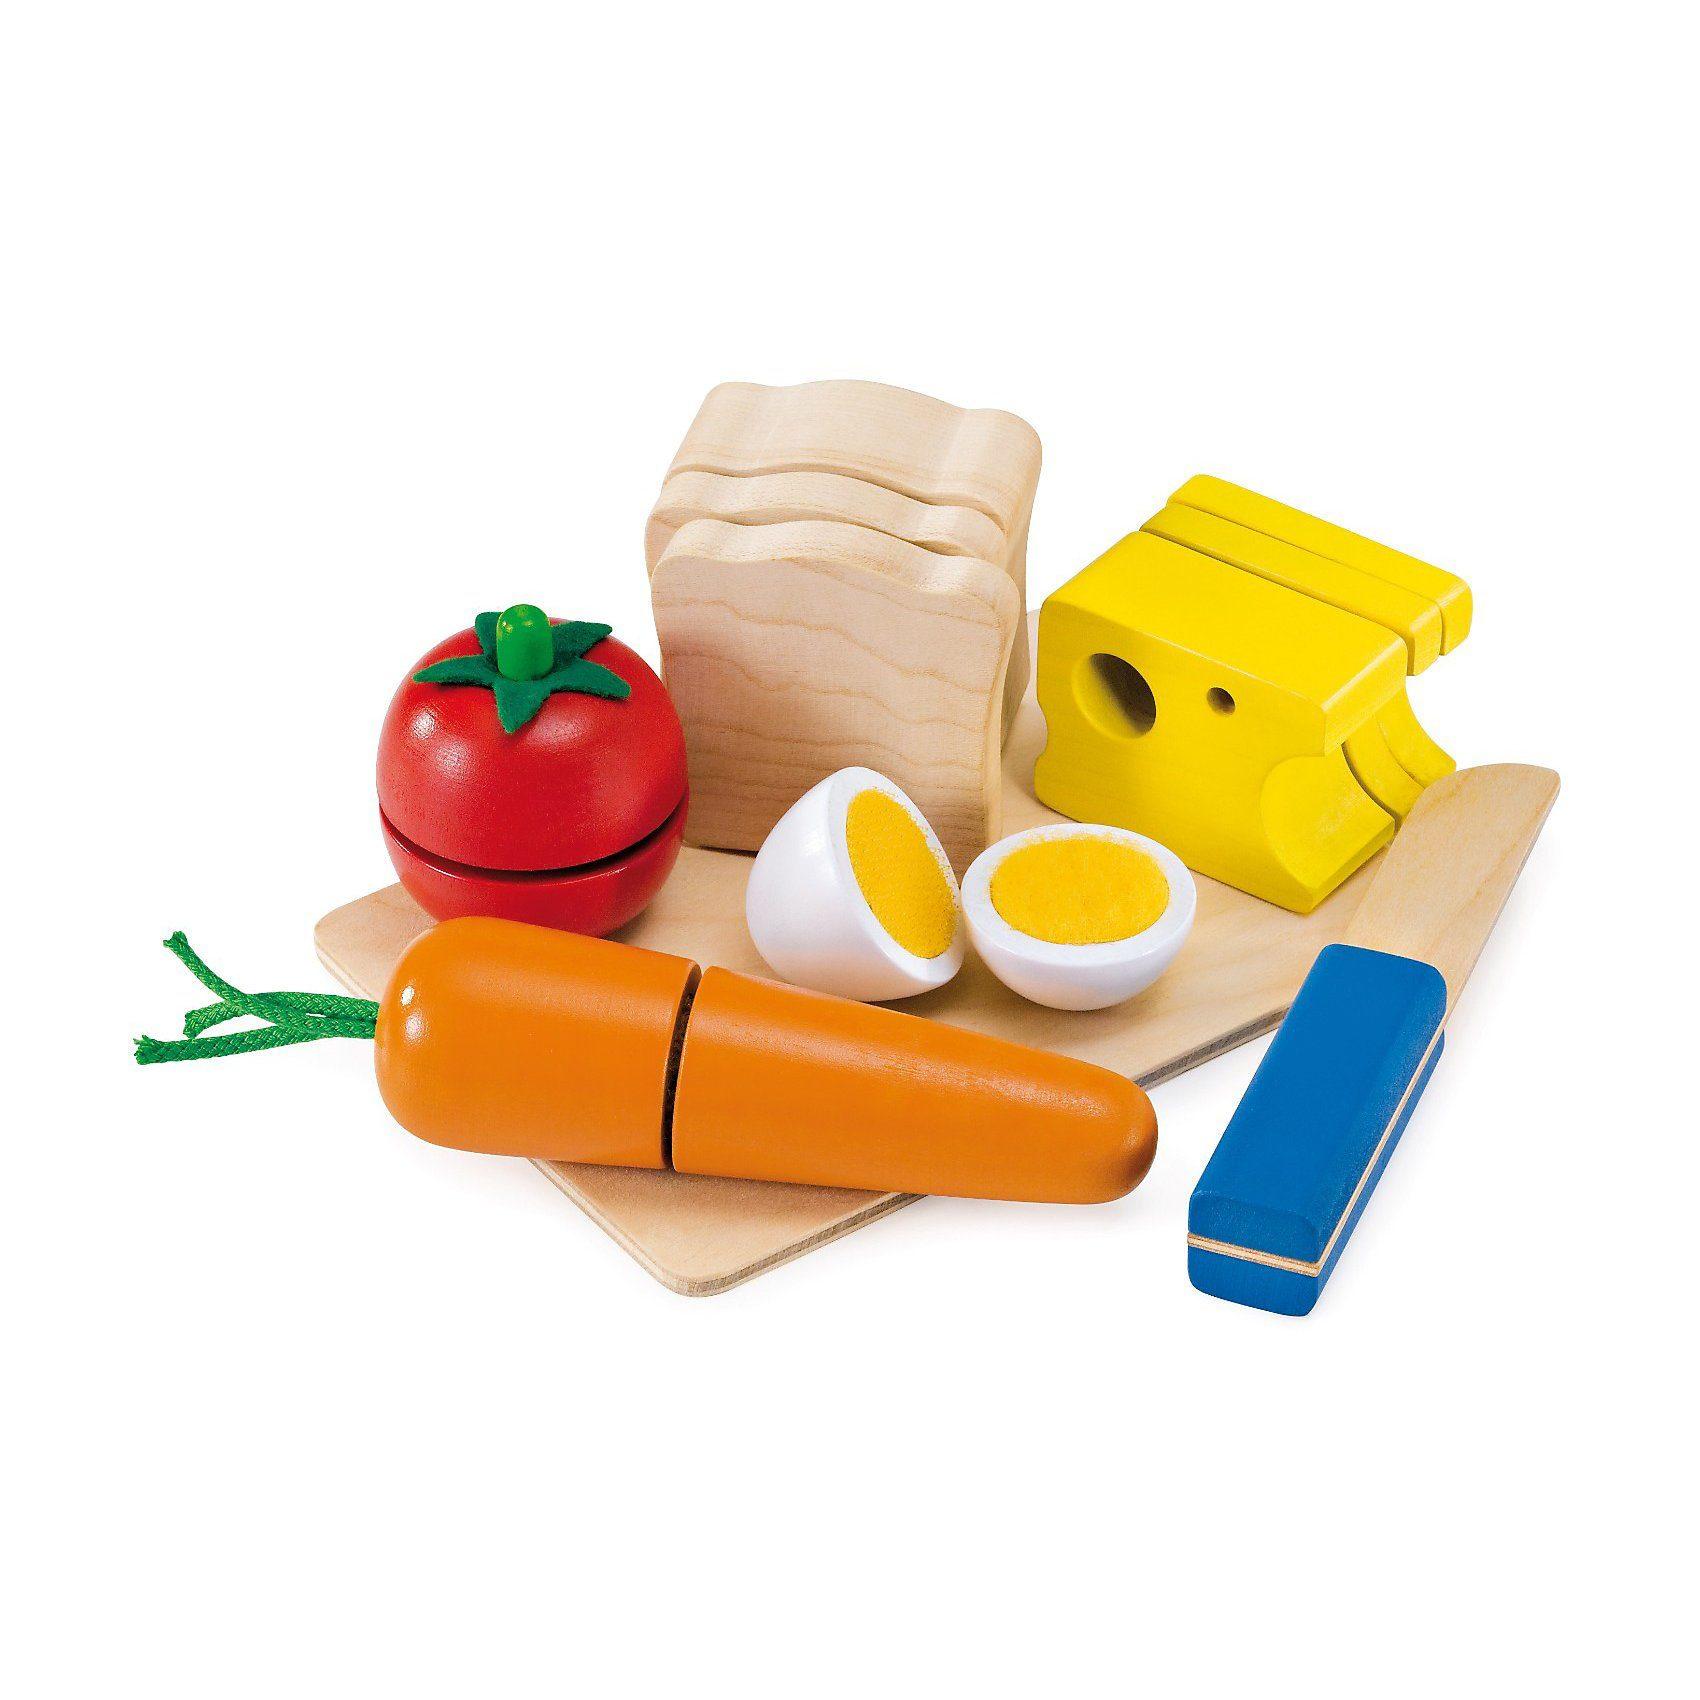 Selecta Spiellebensmittel Picknick Motorikspielzeug